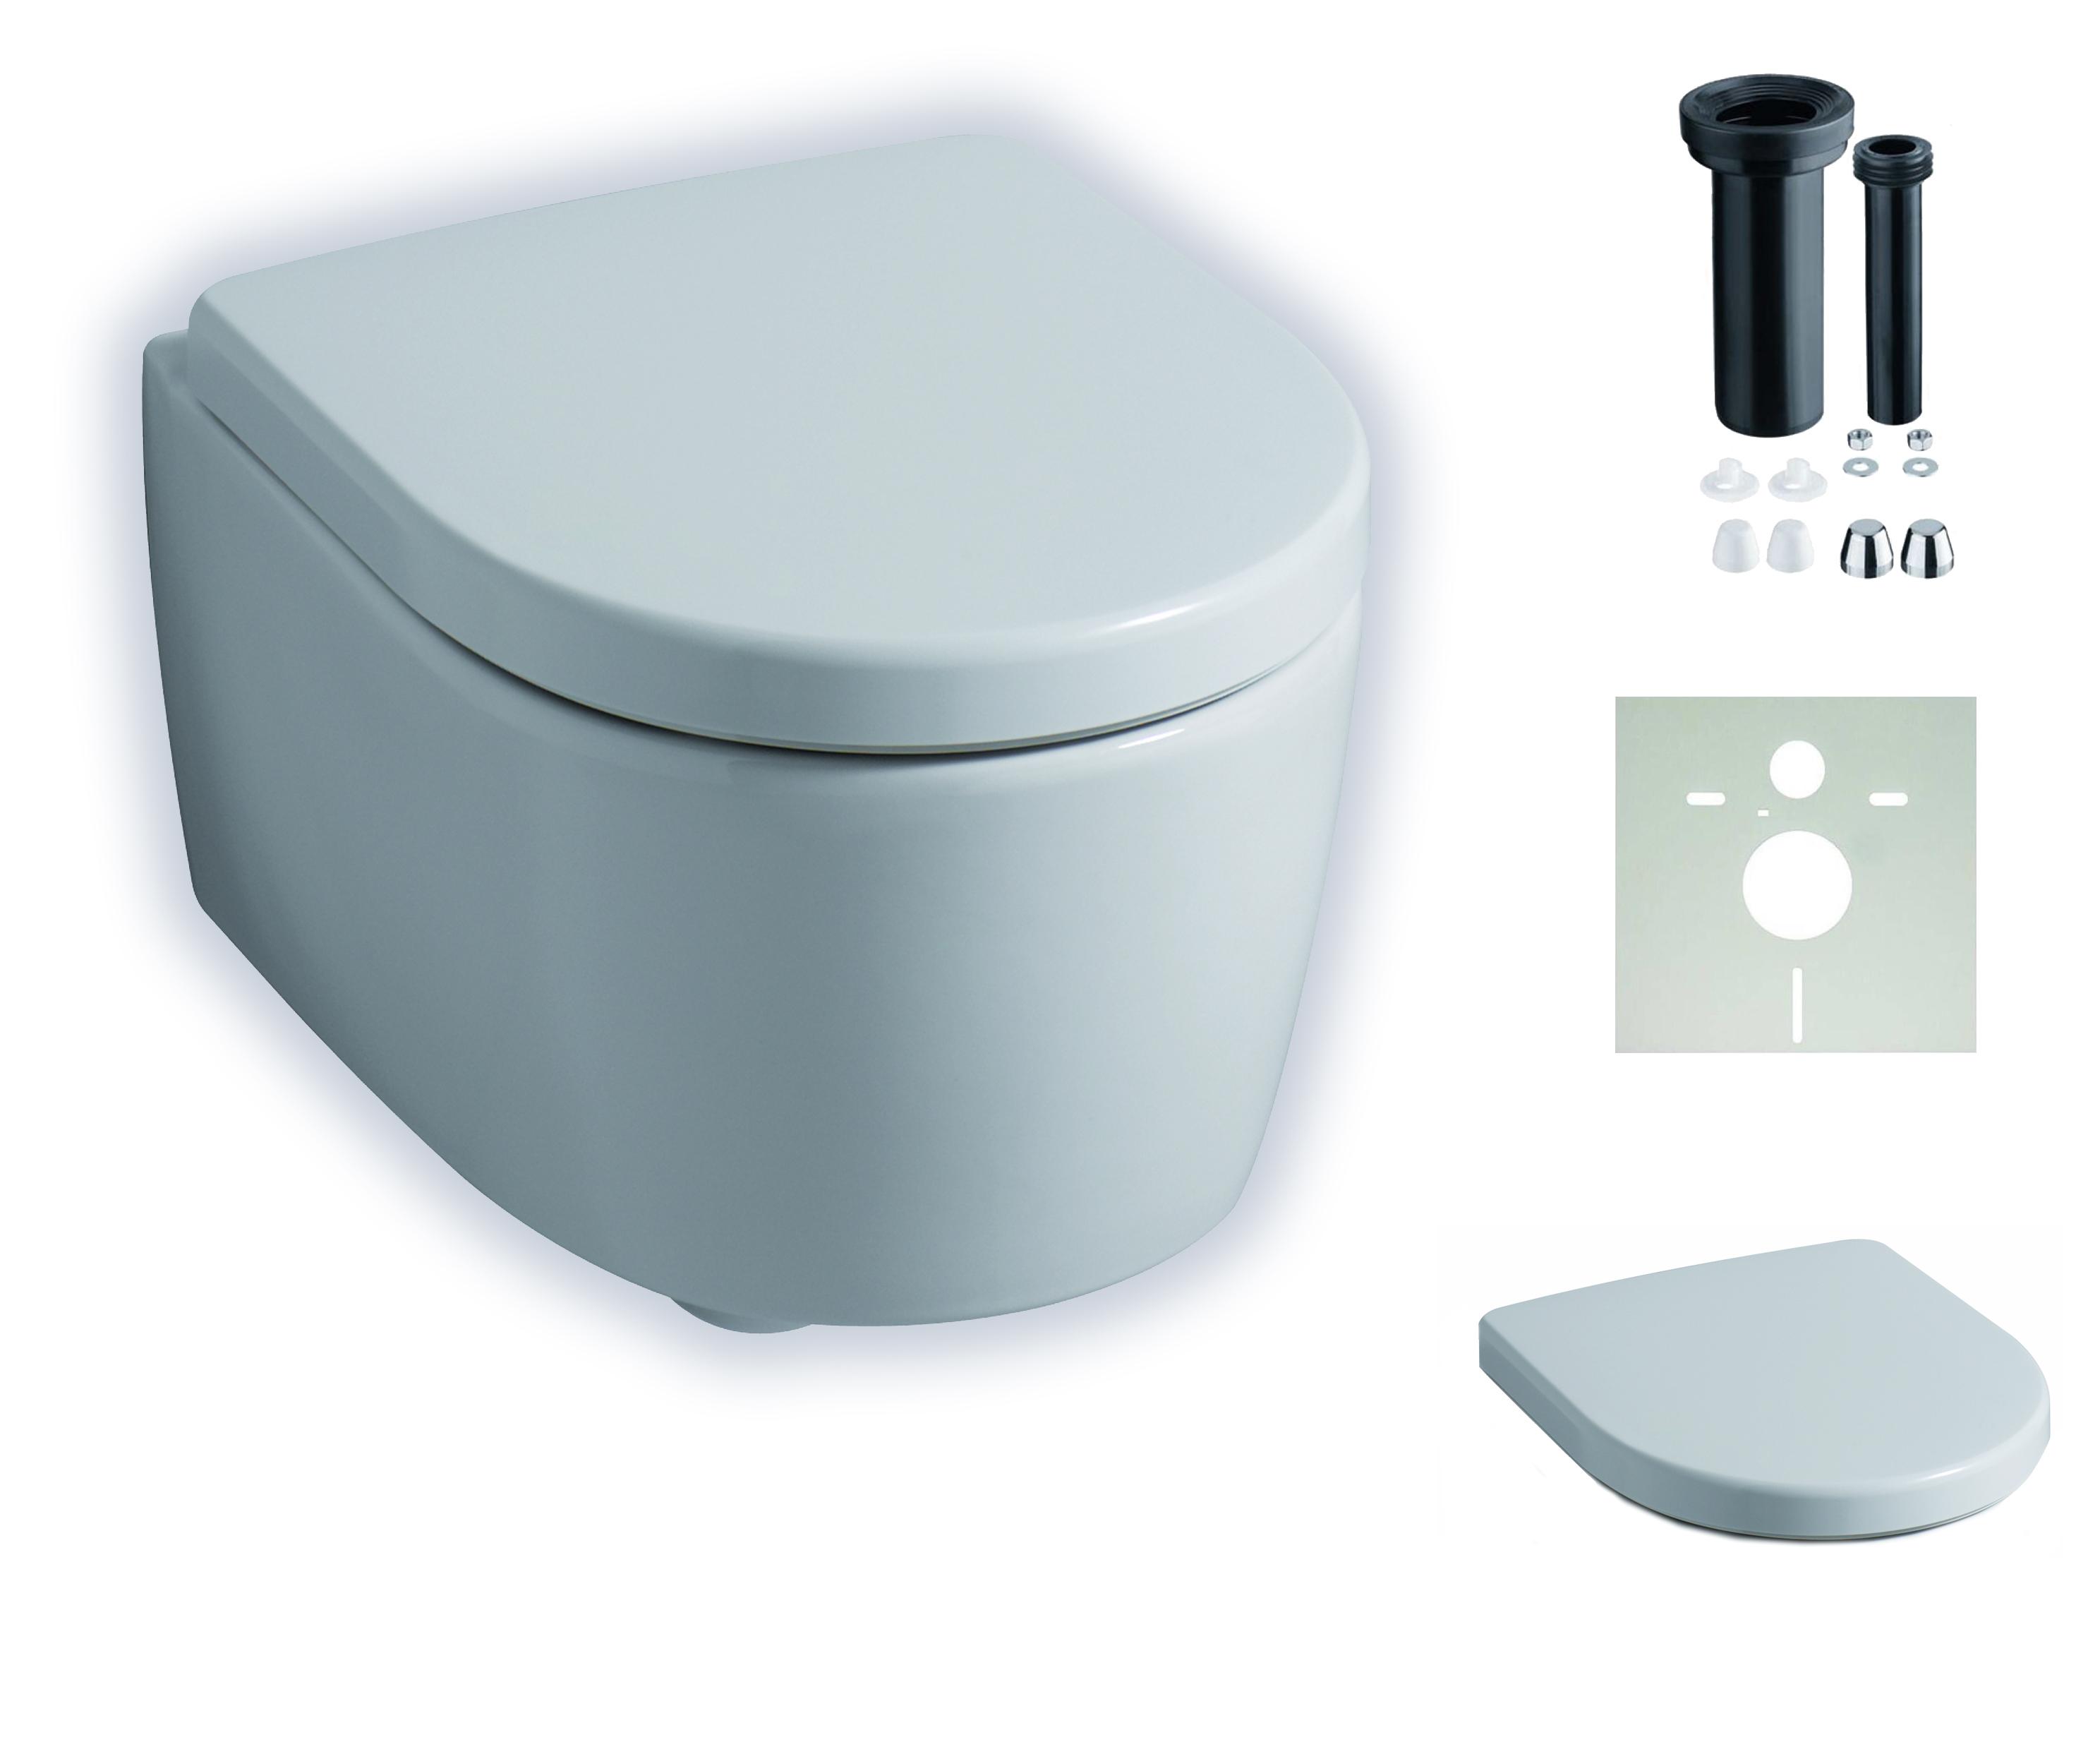 keramikset keramag icon xs sp lrandlos wand wc kera tec beschichtung 204070600 ebay. Black Bedroom Furniture Sets. Home Design Ideas